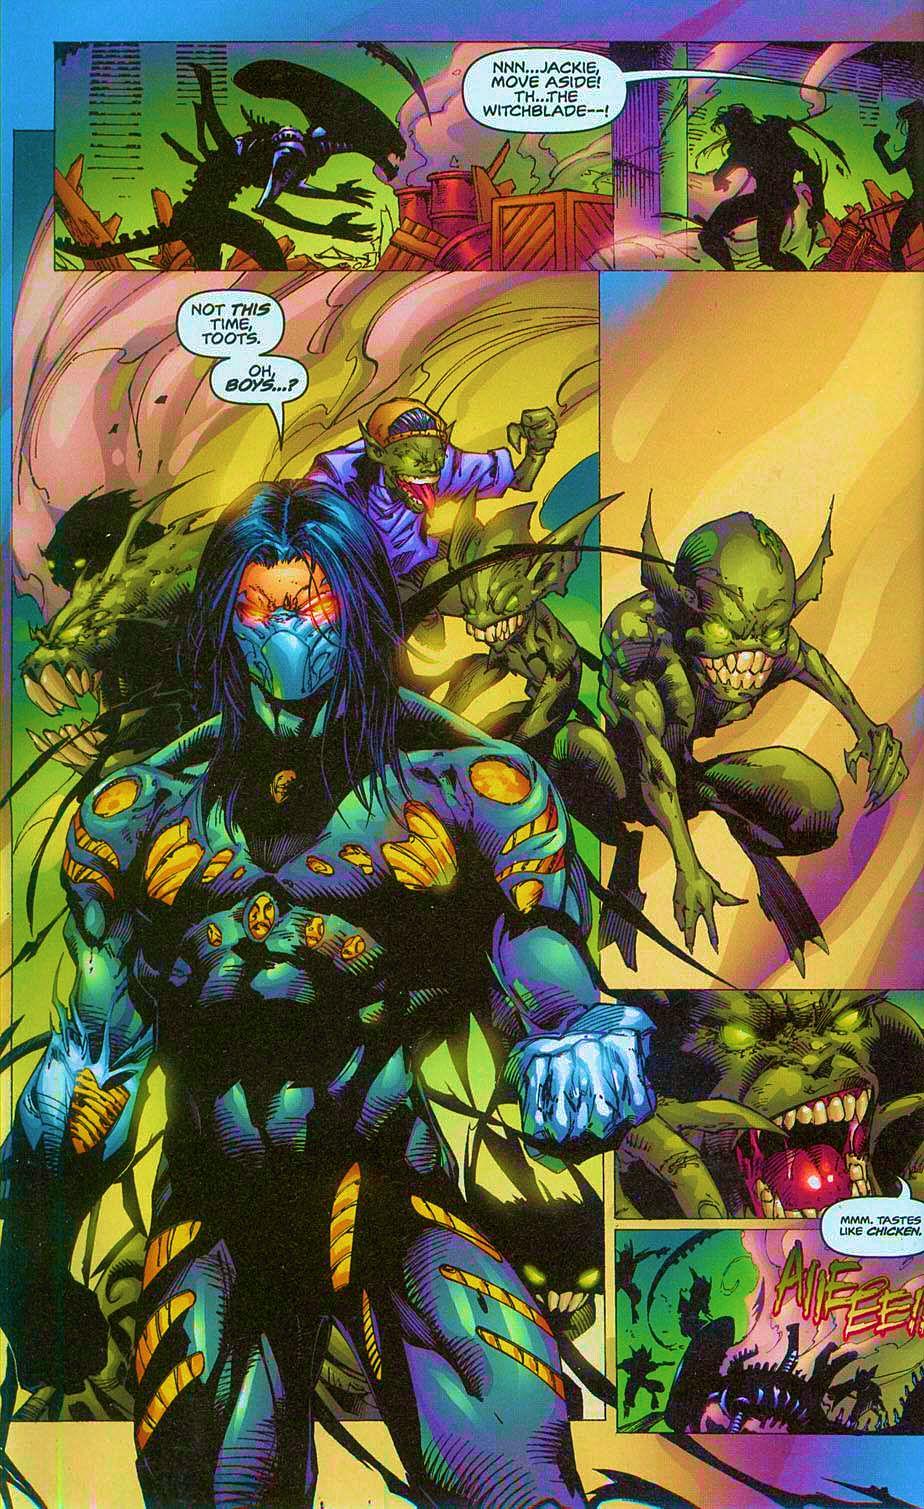 Read online Overkill: Witchblade/Aliens/Darkness/Predator comic -  Issue #2 - 17